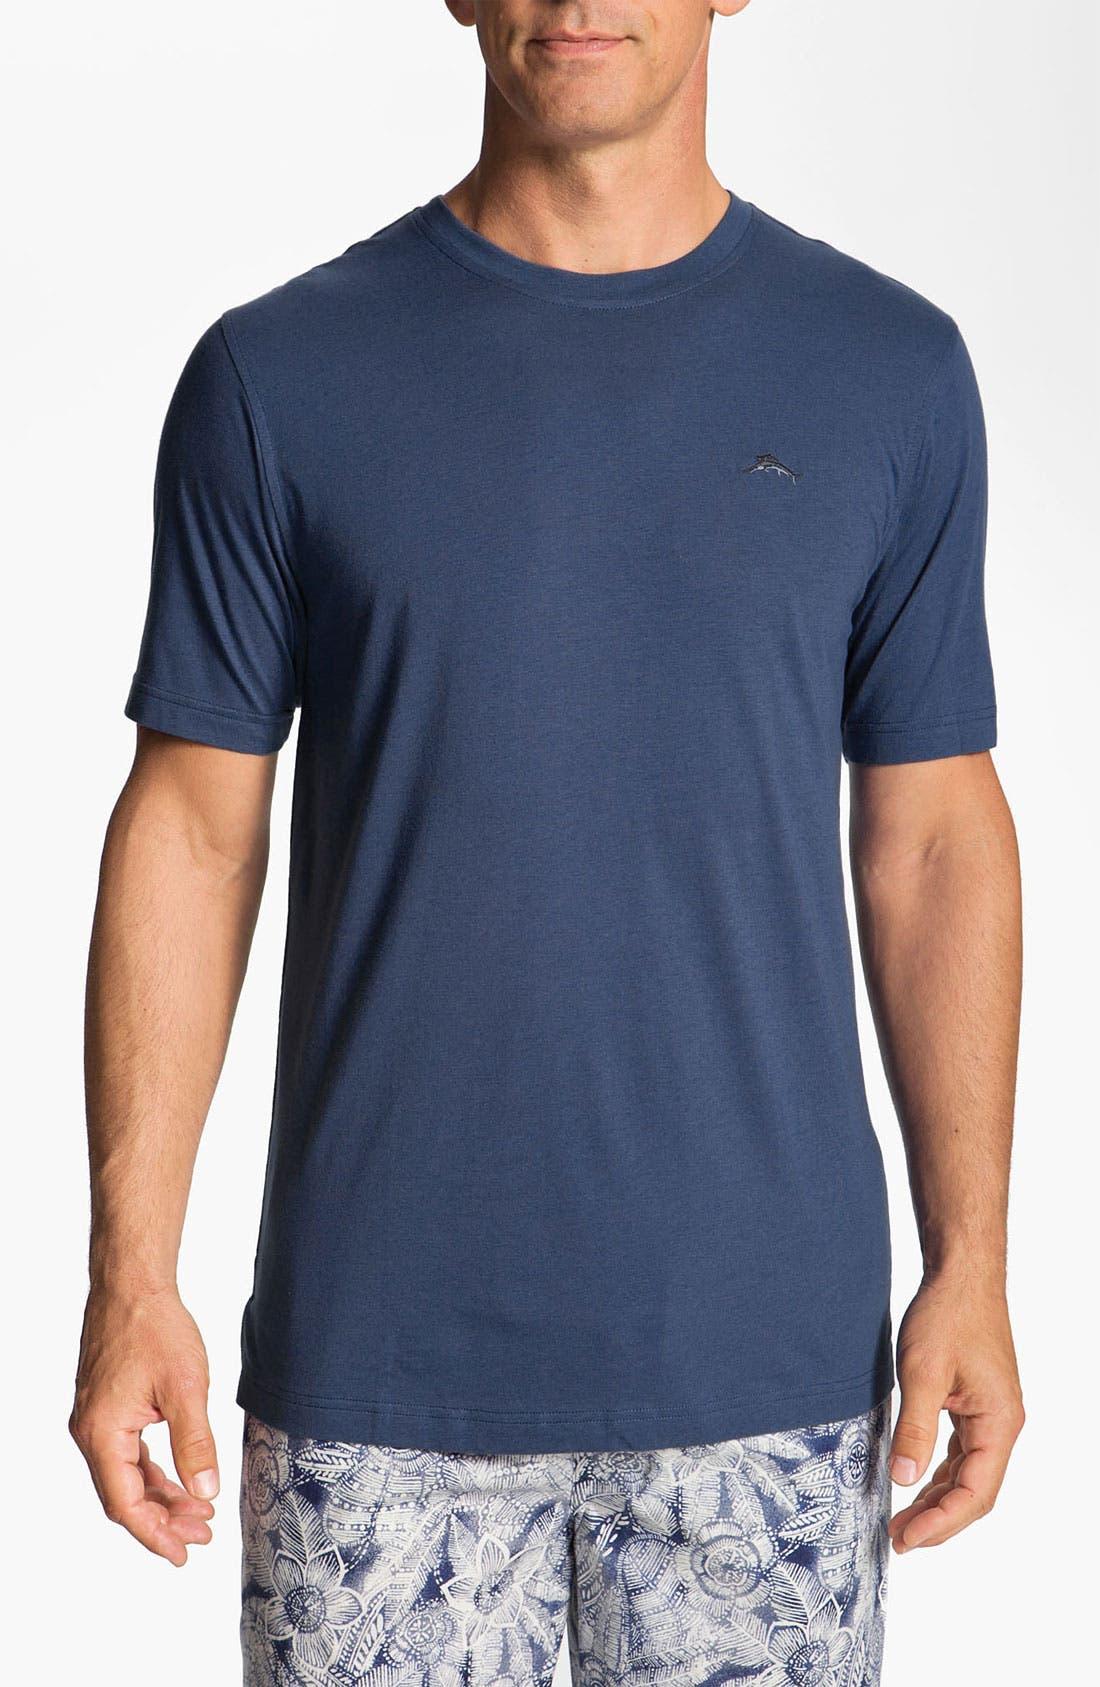 Main Image - Tommy Bahama Cotton Blend T-Shirt